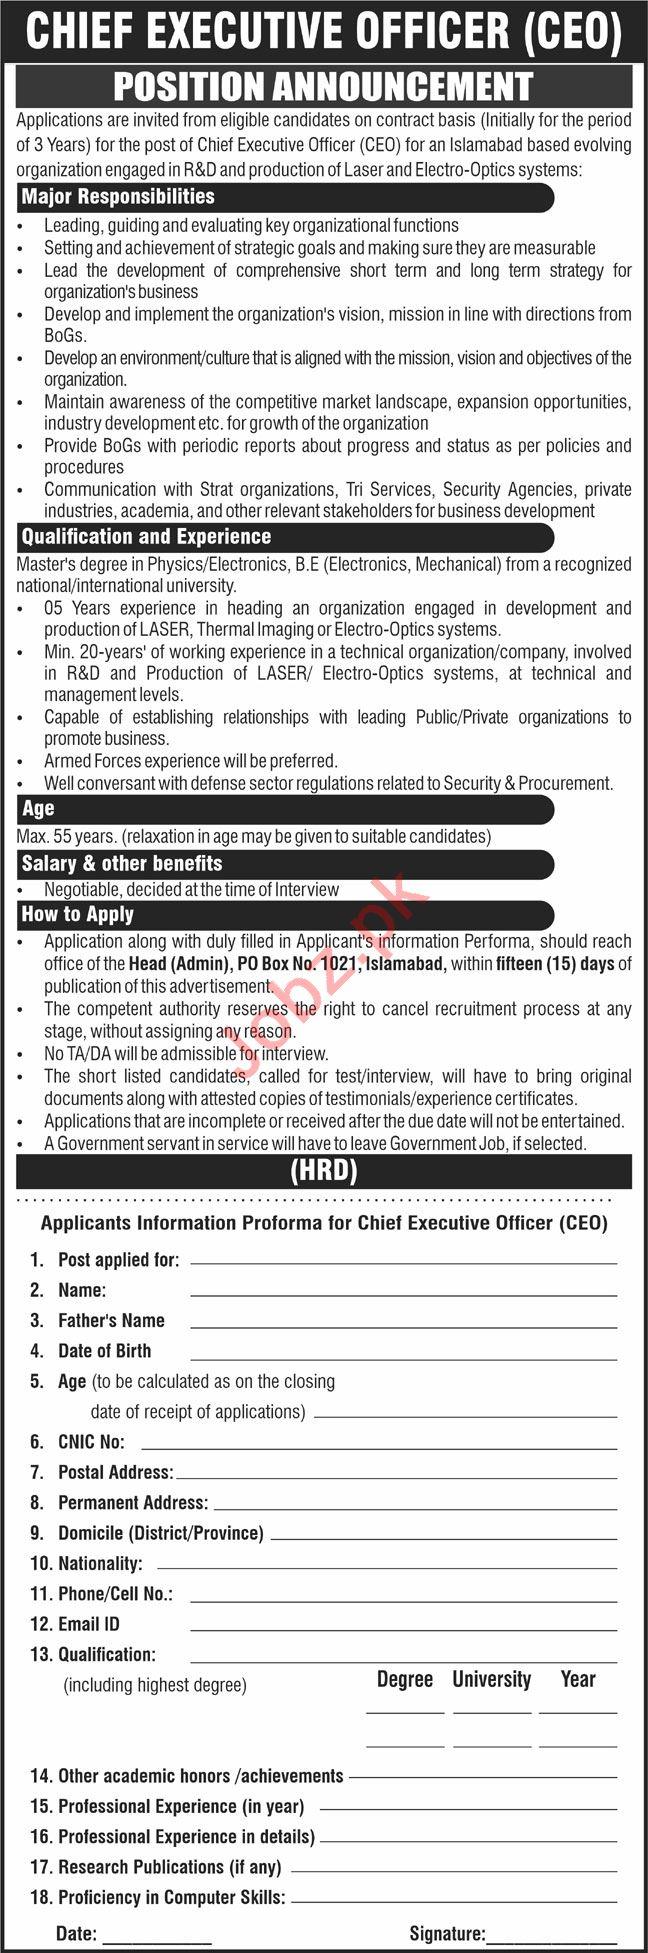 Public Sector Organization Jobs 2021 Chief Executive Officer